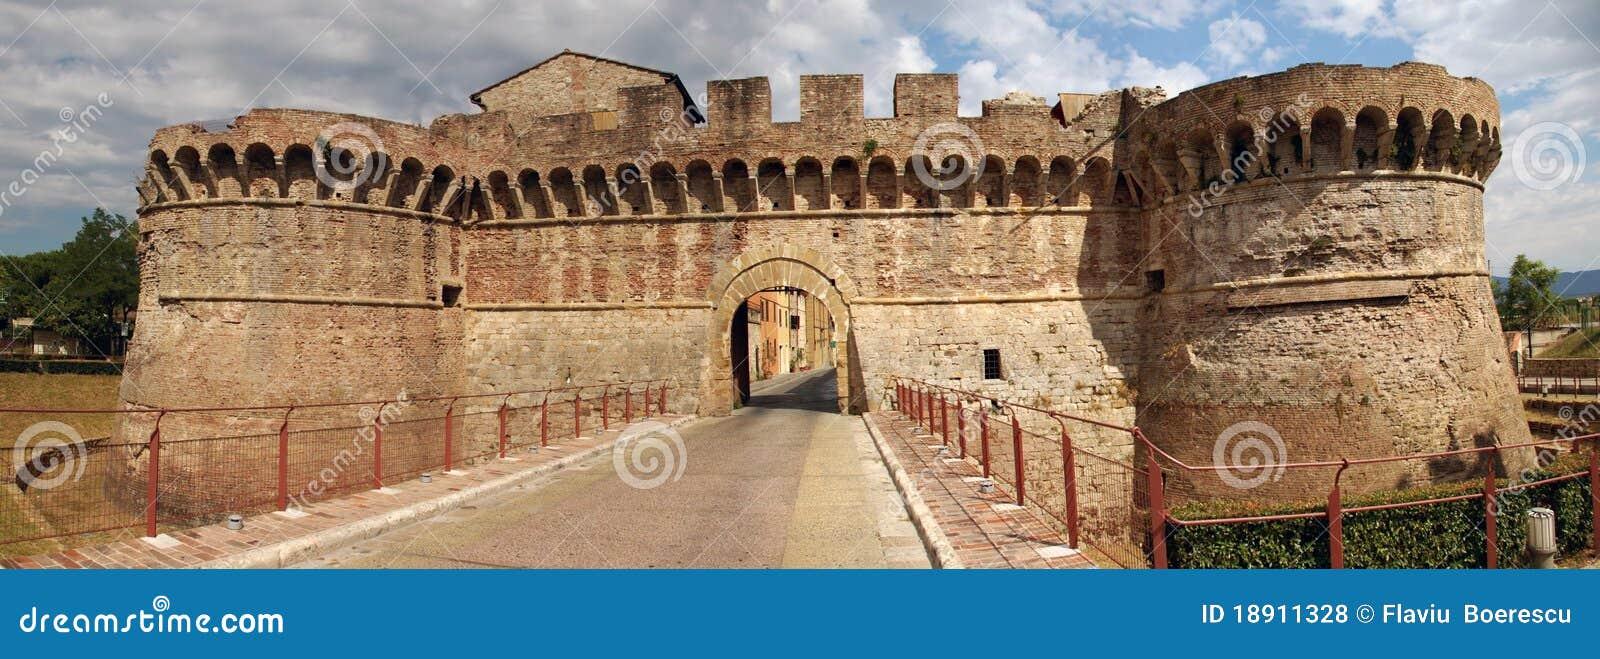 Fästning italy tuscany